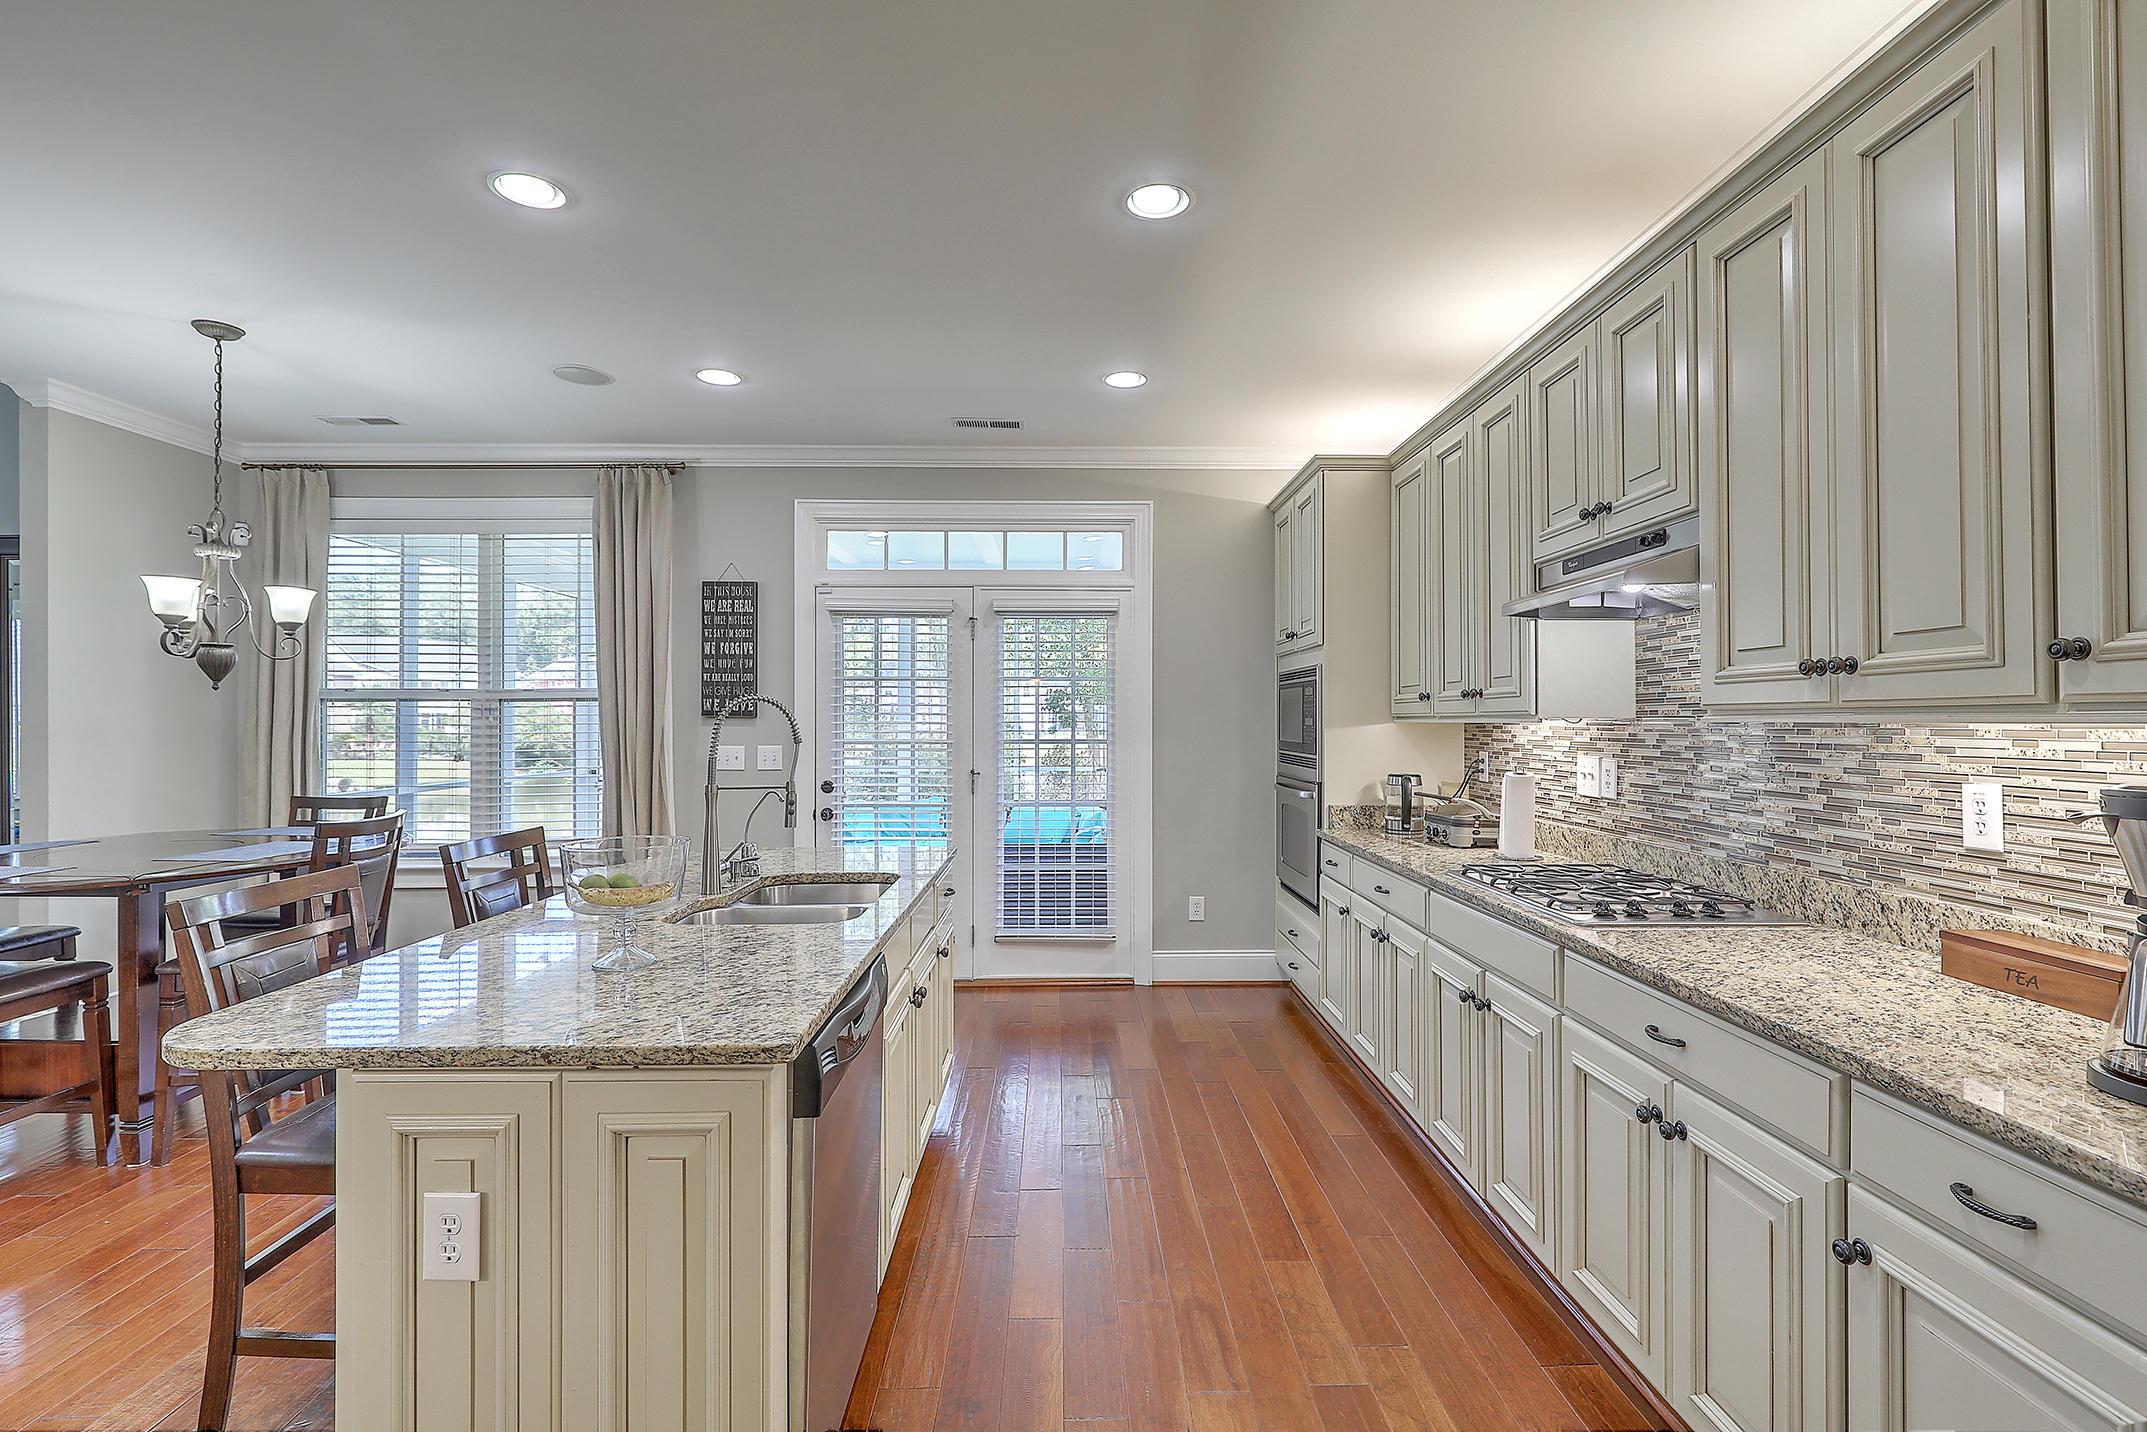 Branch Creek Homes For Sale - 304 Pond Hill, Summerville, SC - 12